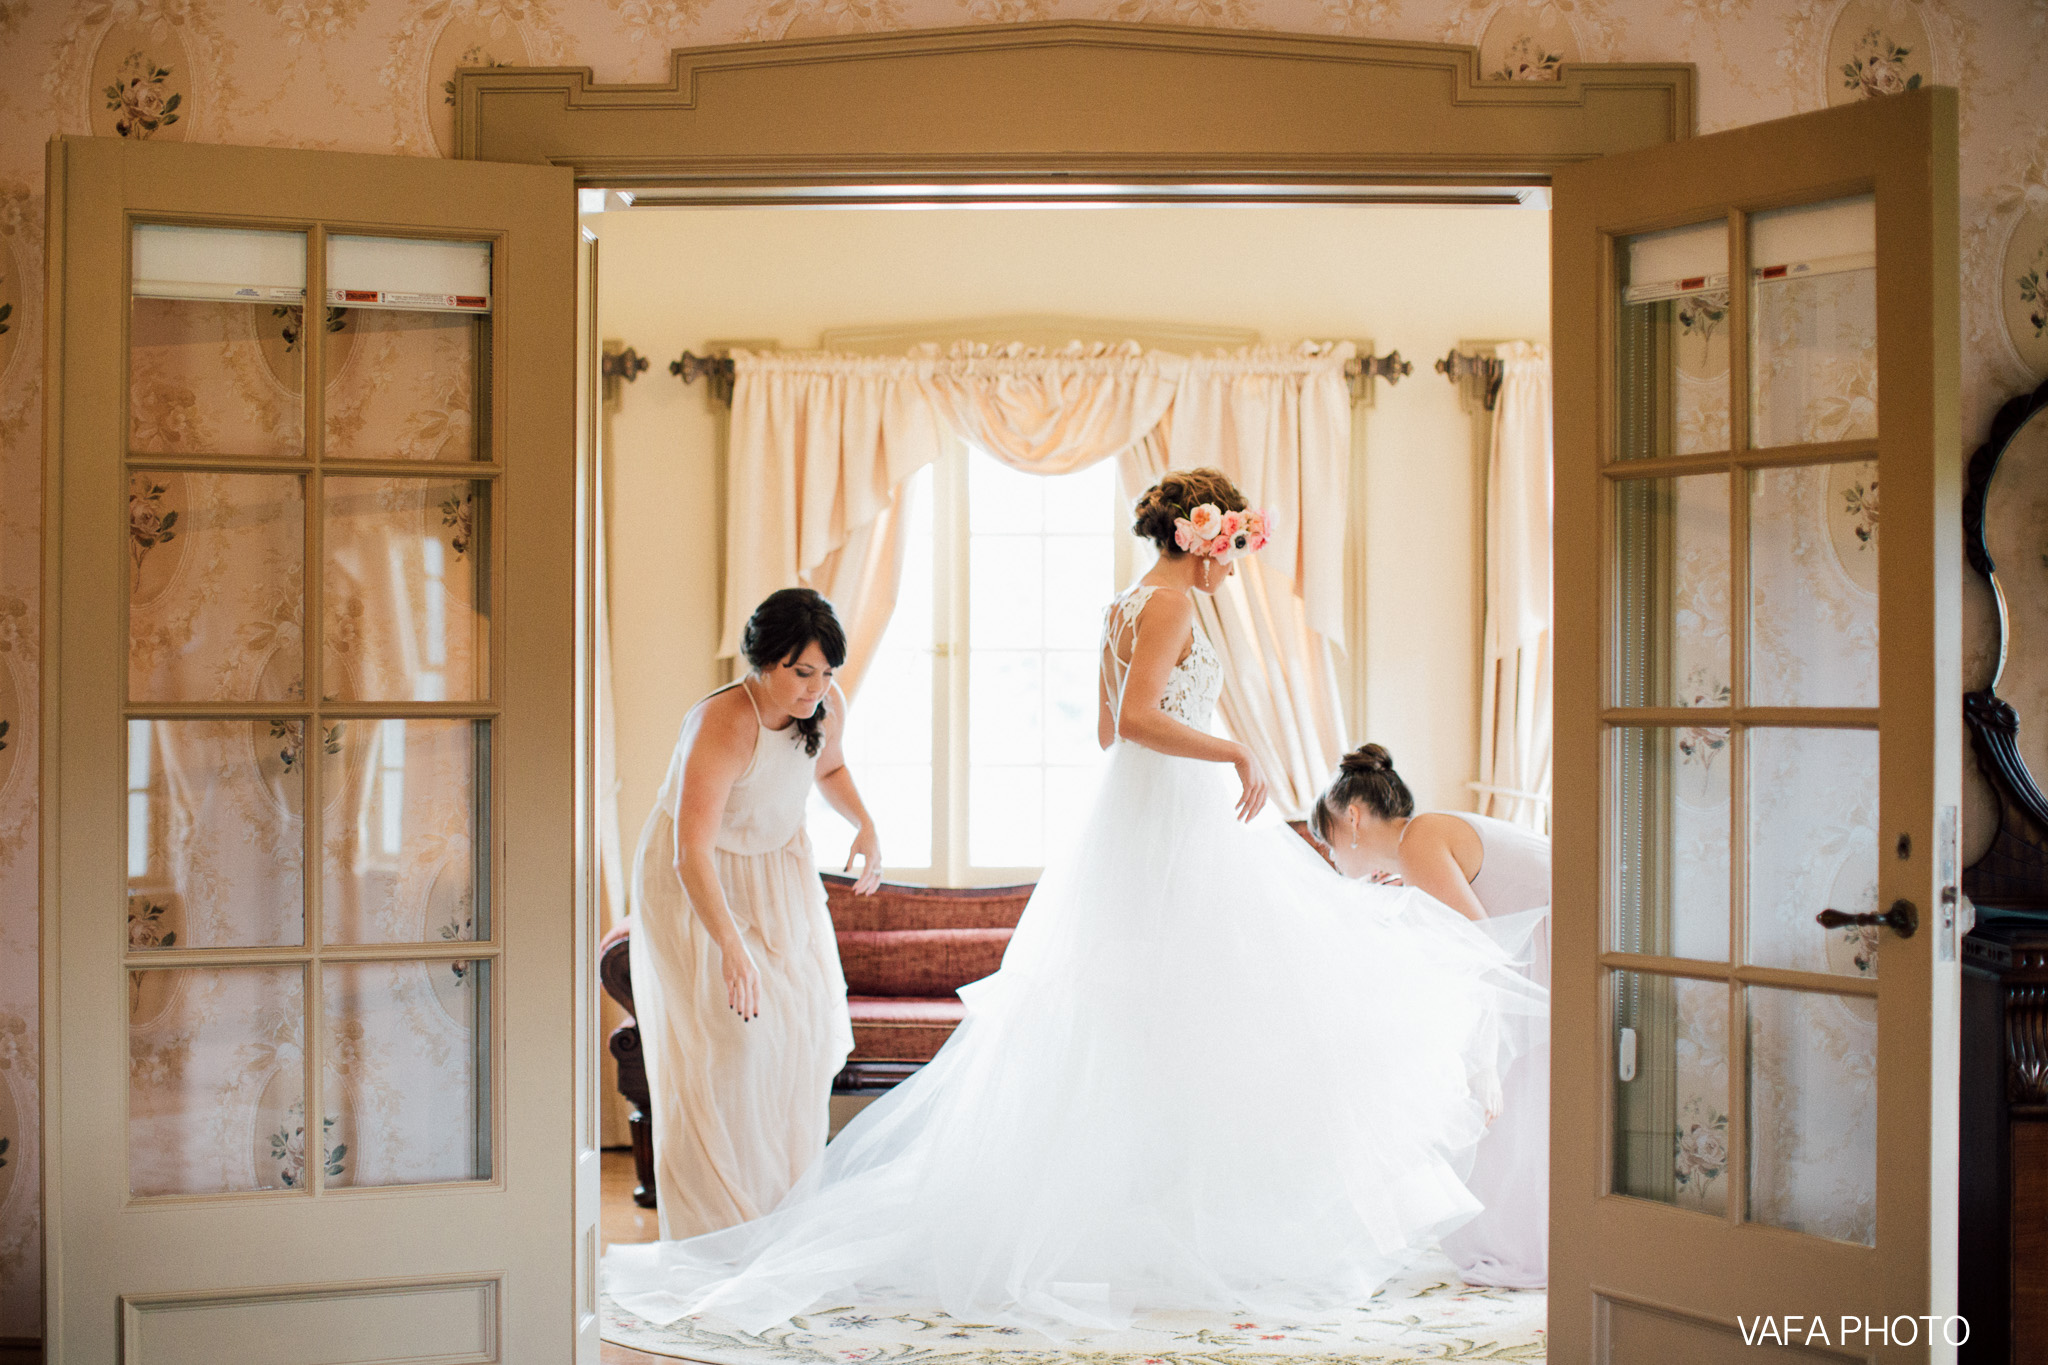 The-Felt-Estate-Wedding-Kailie-David-Vafa-Photo-174.jpg